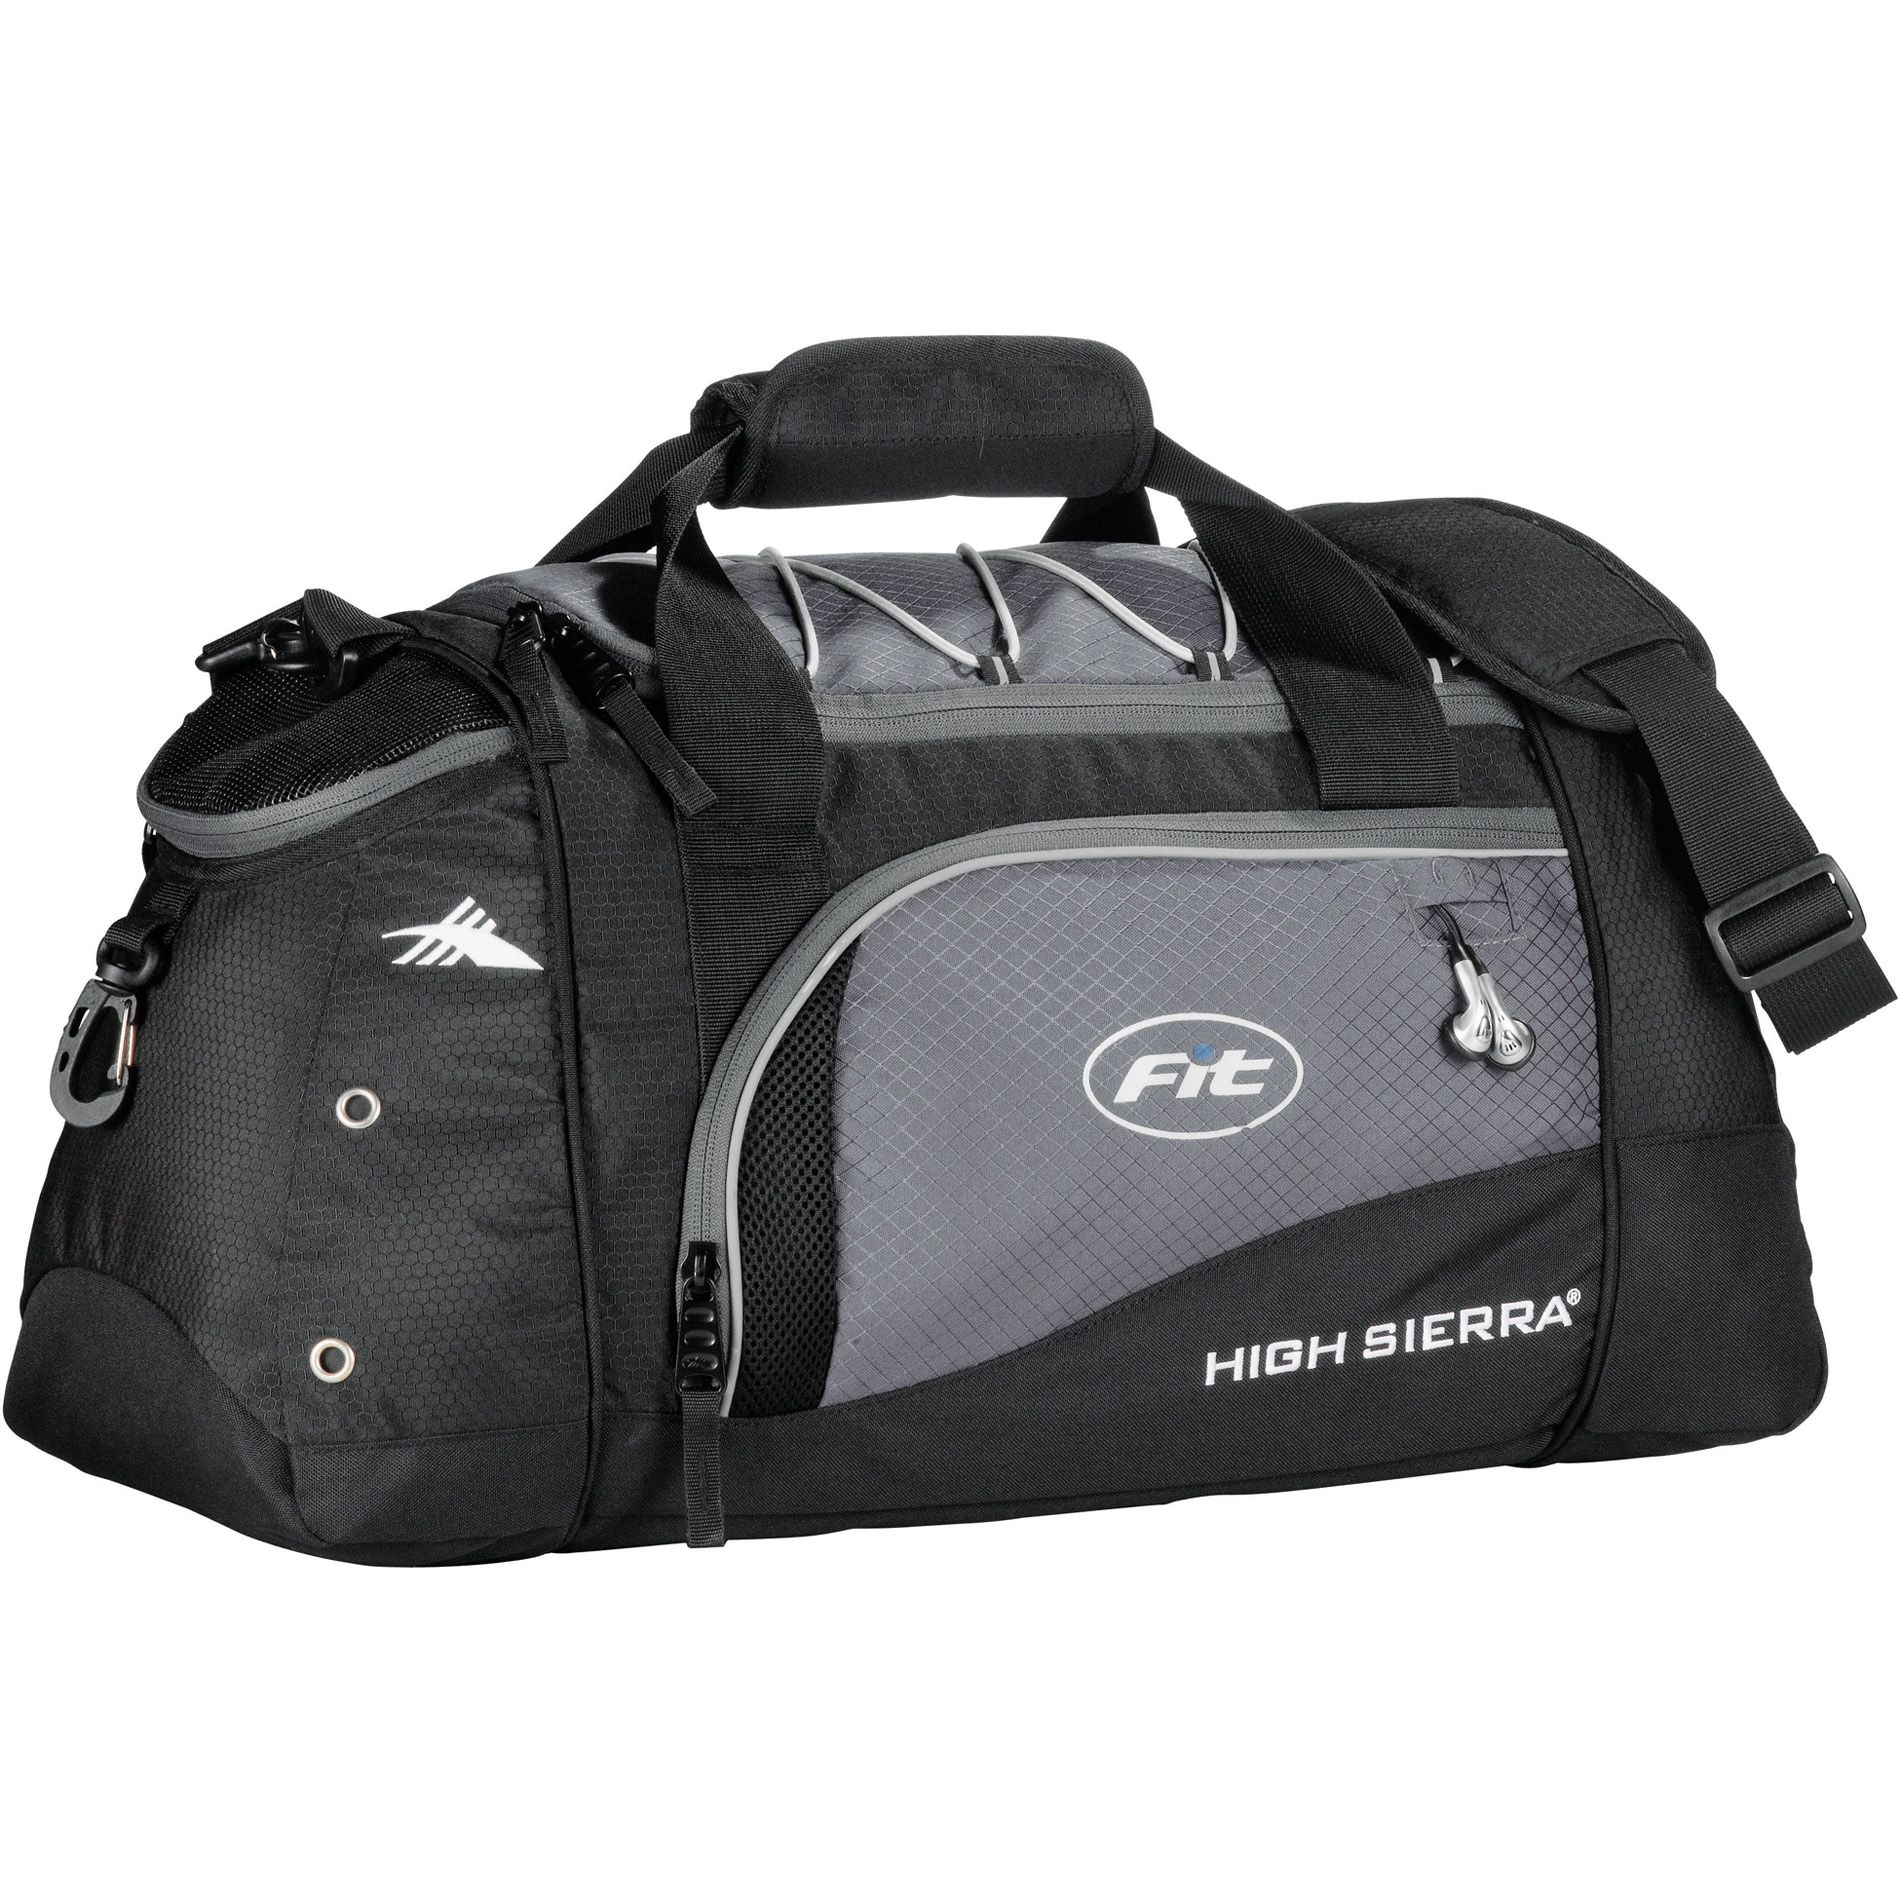 "High Sierra 21"" Sport Duffel Duffel, Duffel bag, Bags"